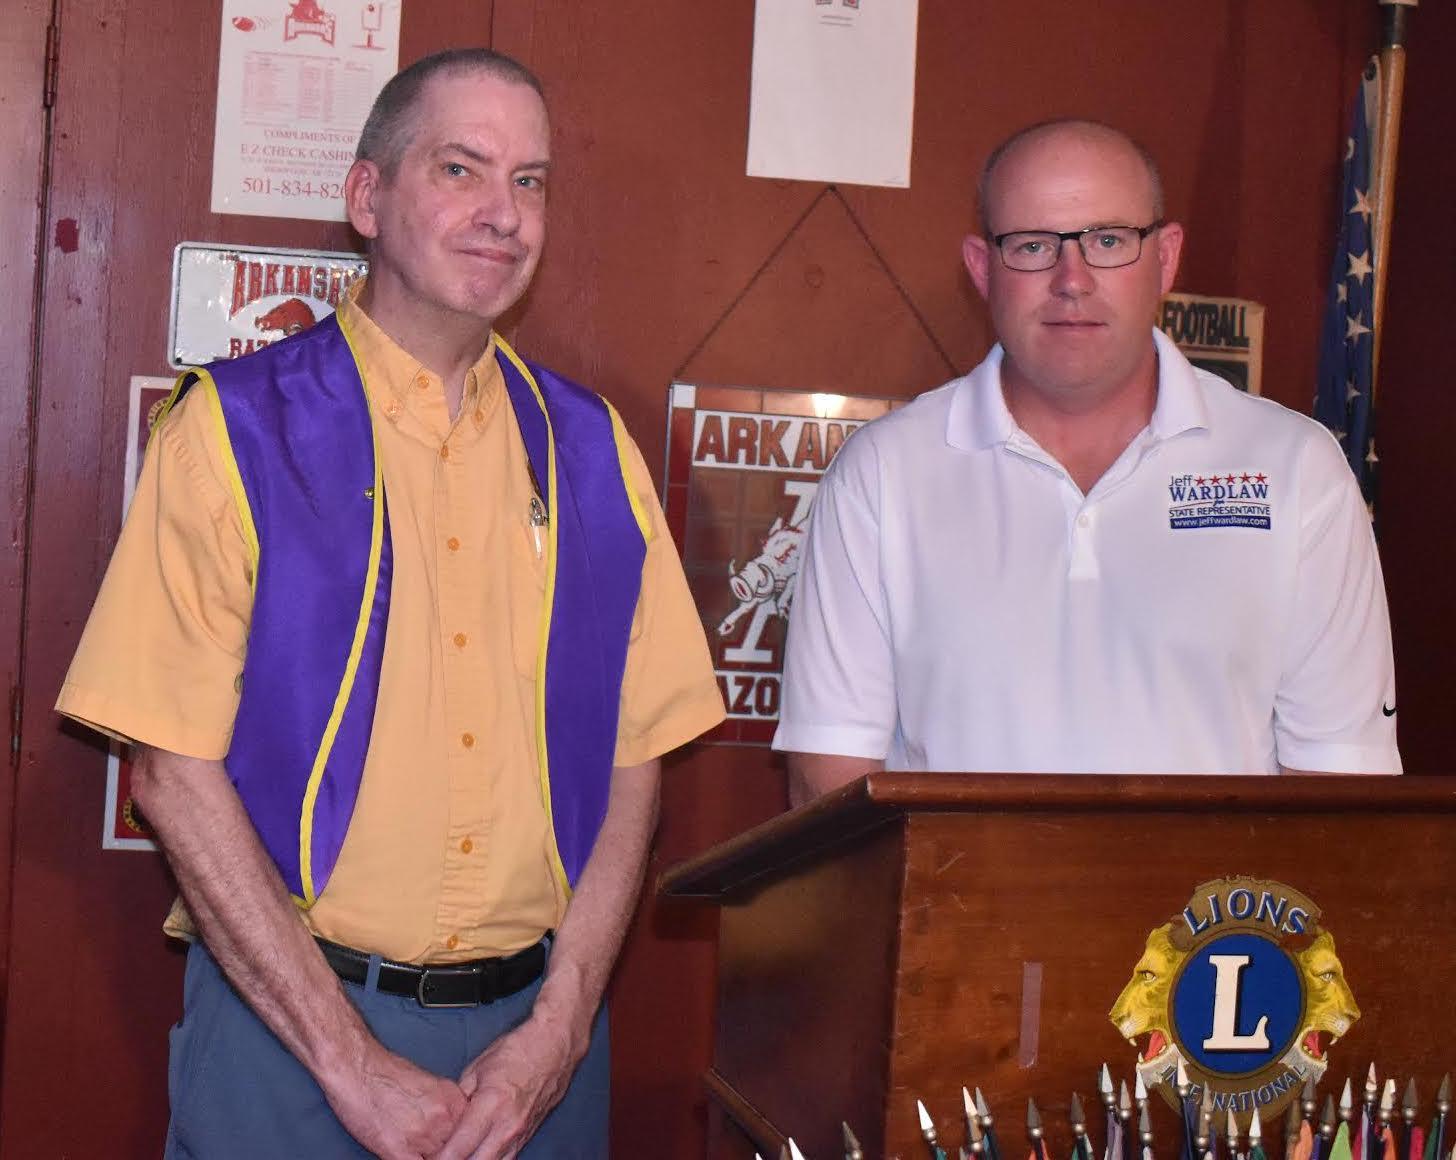 State Rep. Jeff Wardlaw speaks to Warren Lions Club